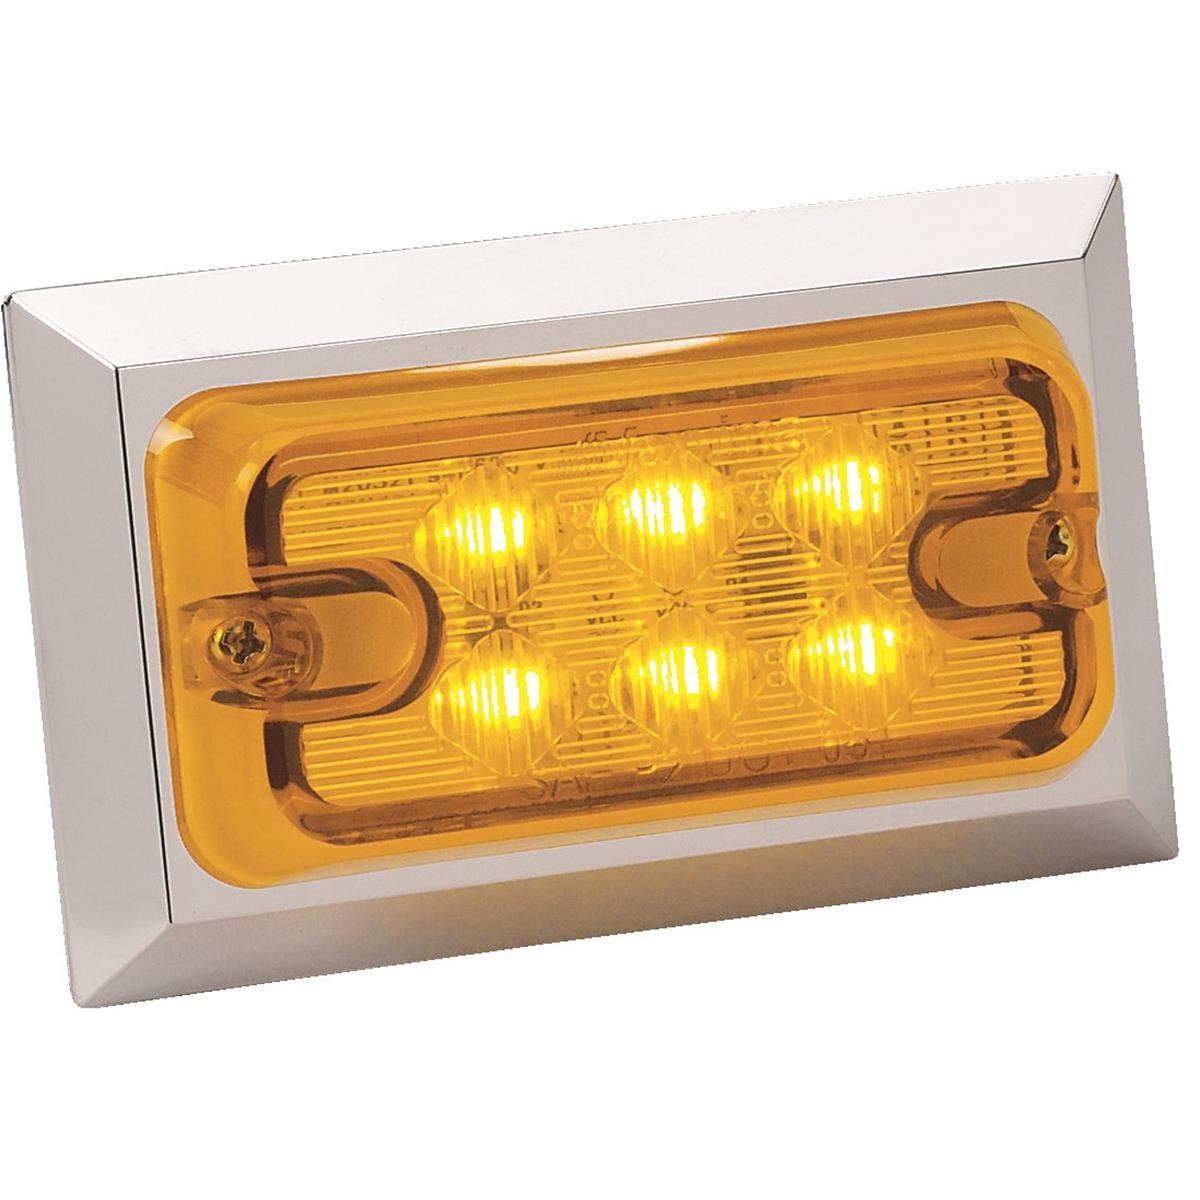 "MAXXIMA Rectangular LED Clearance Marker Light Chrome Trim Amber 3 3 4""L x 2 1 4""H x 1""D"